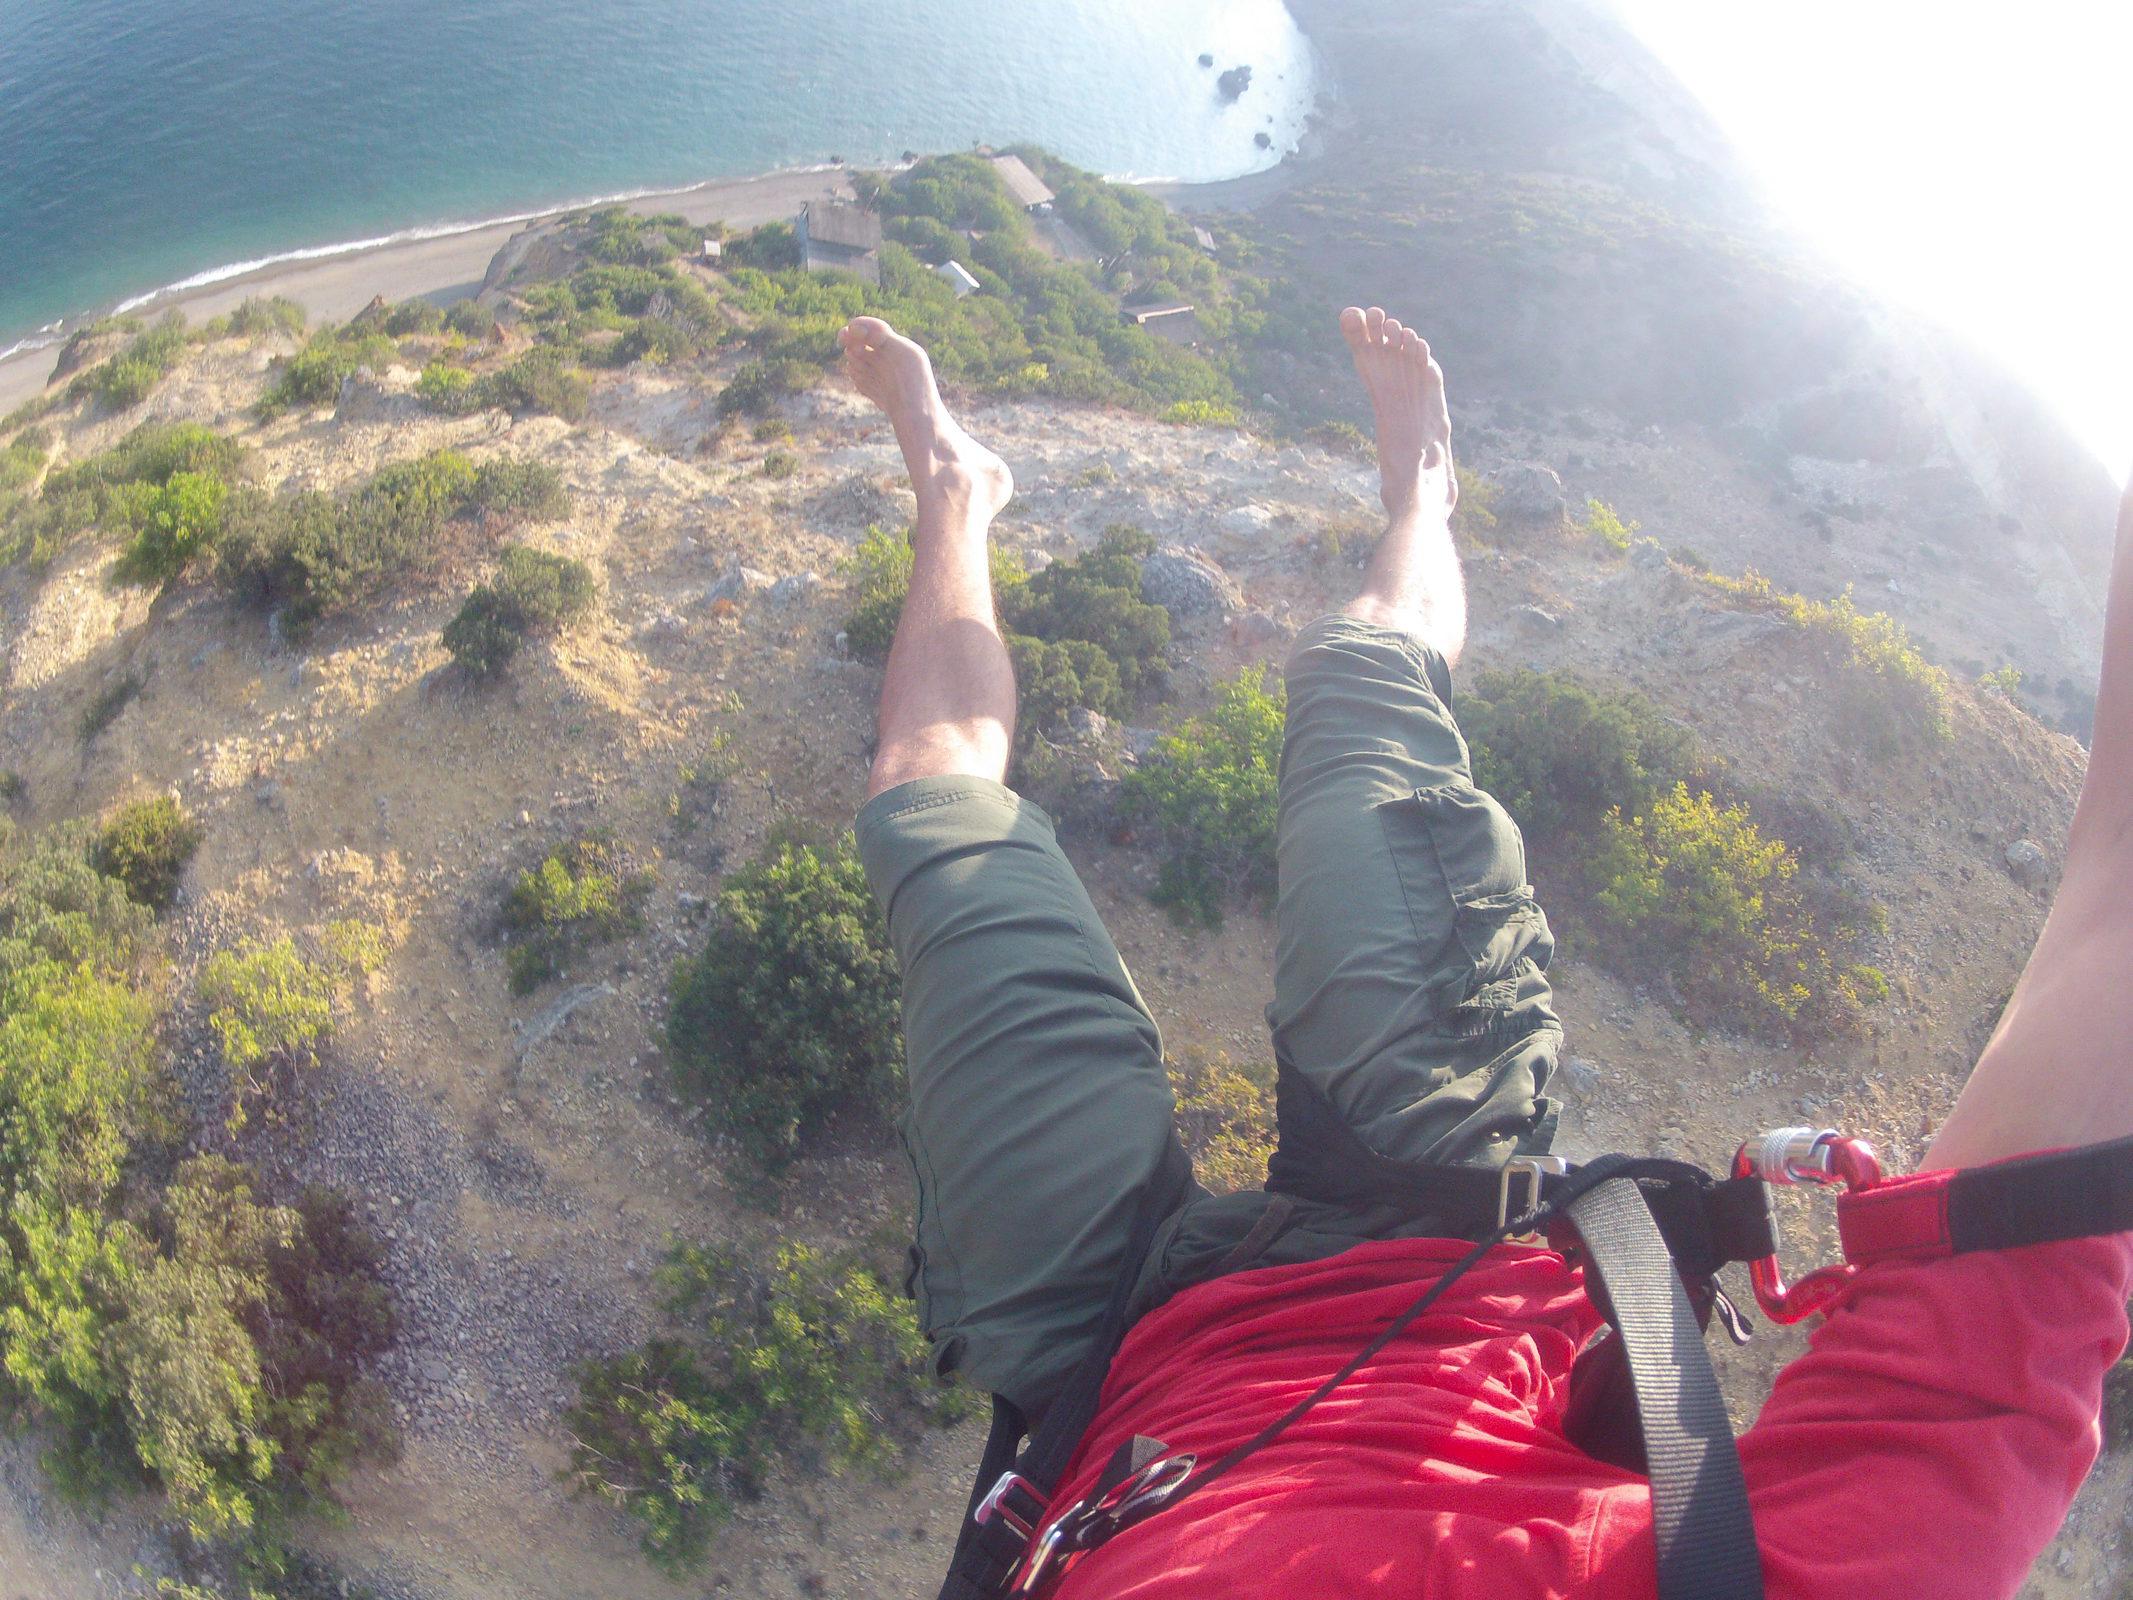 Barefoot speedflying